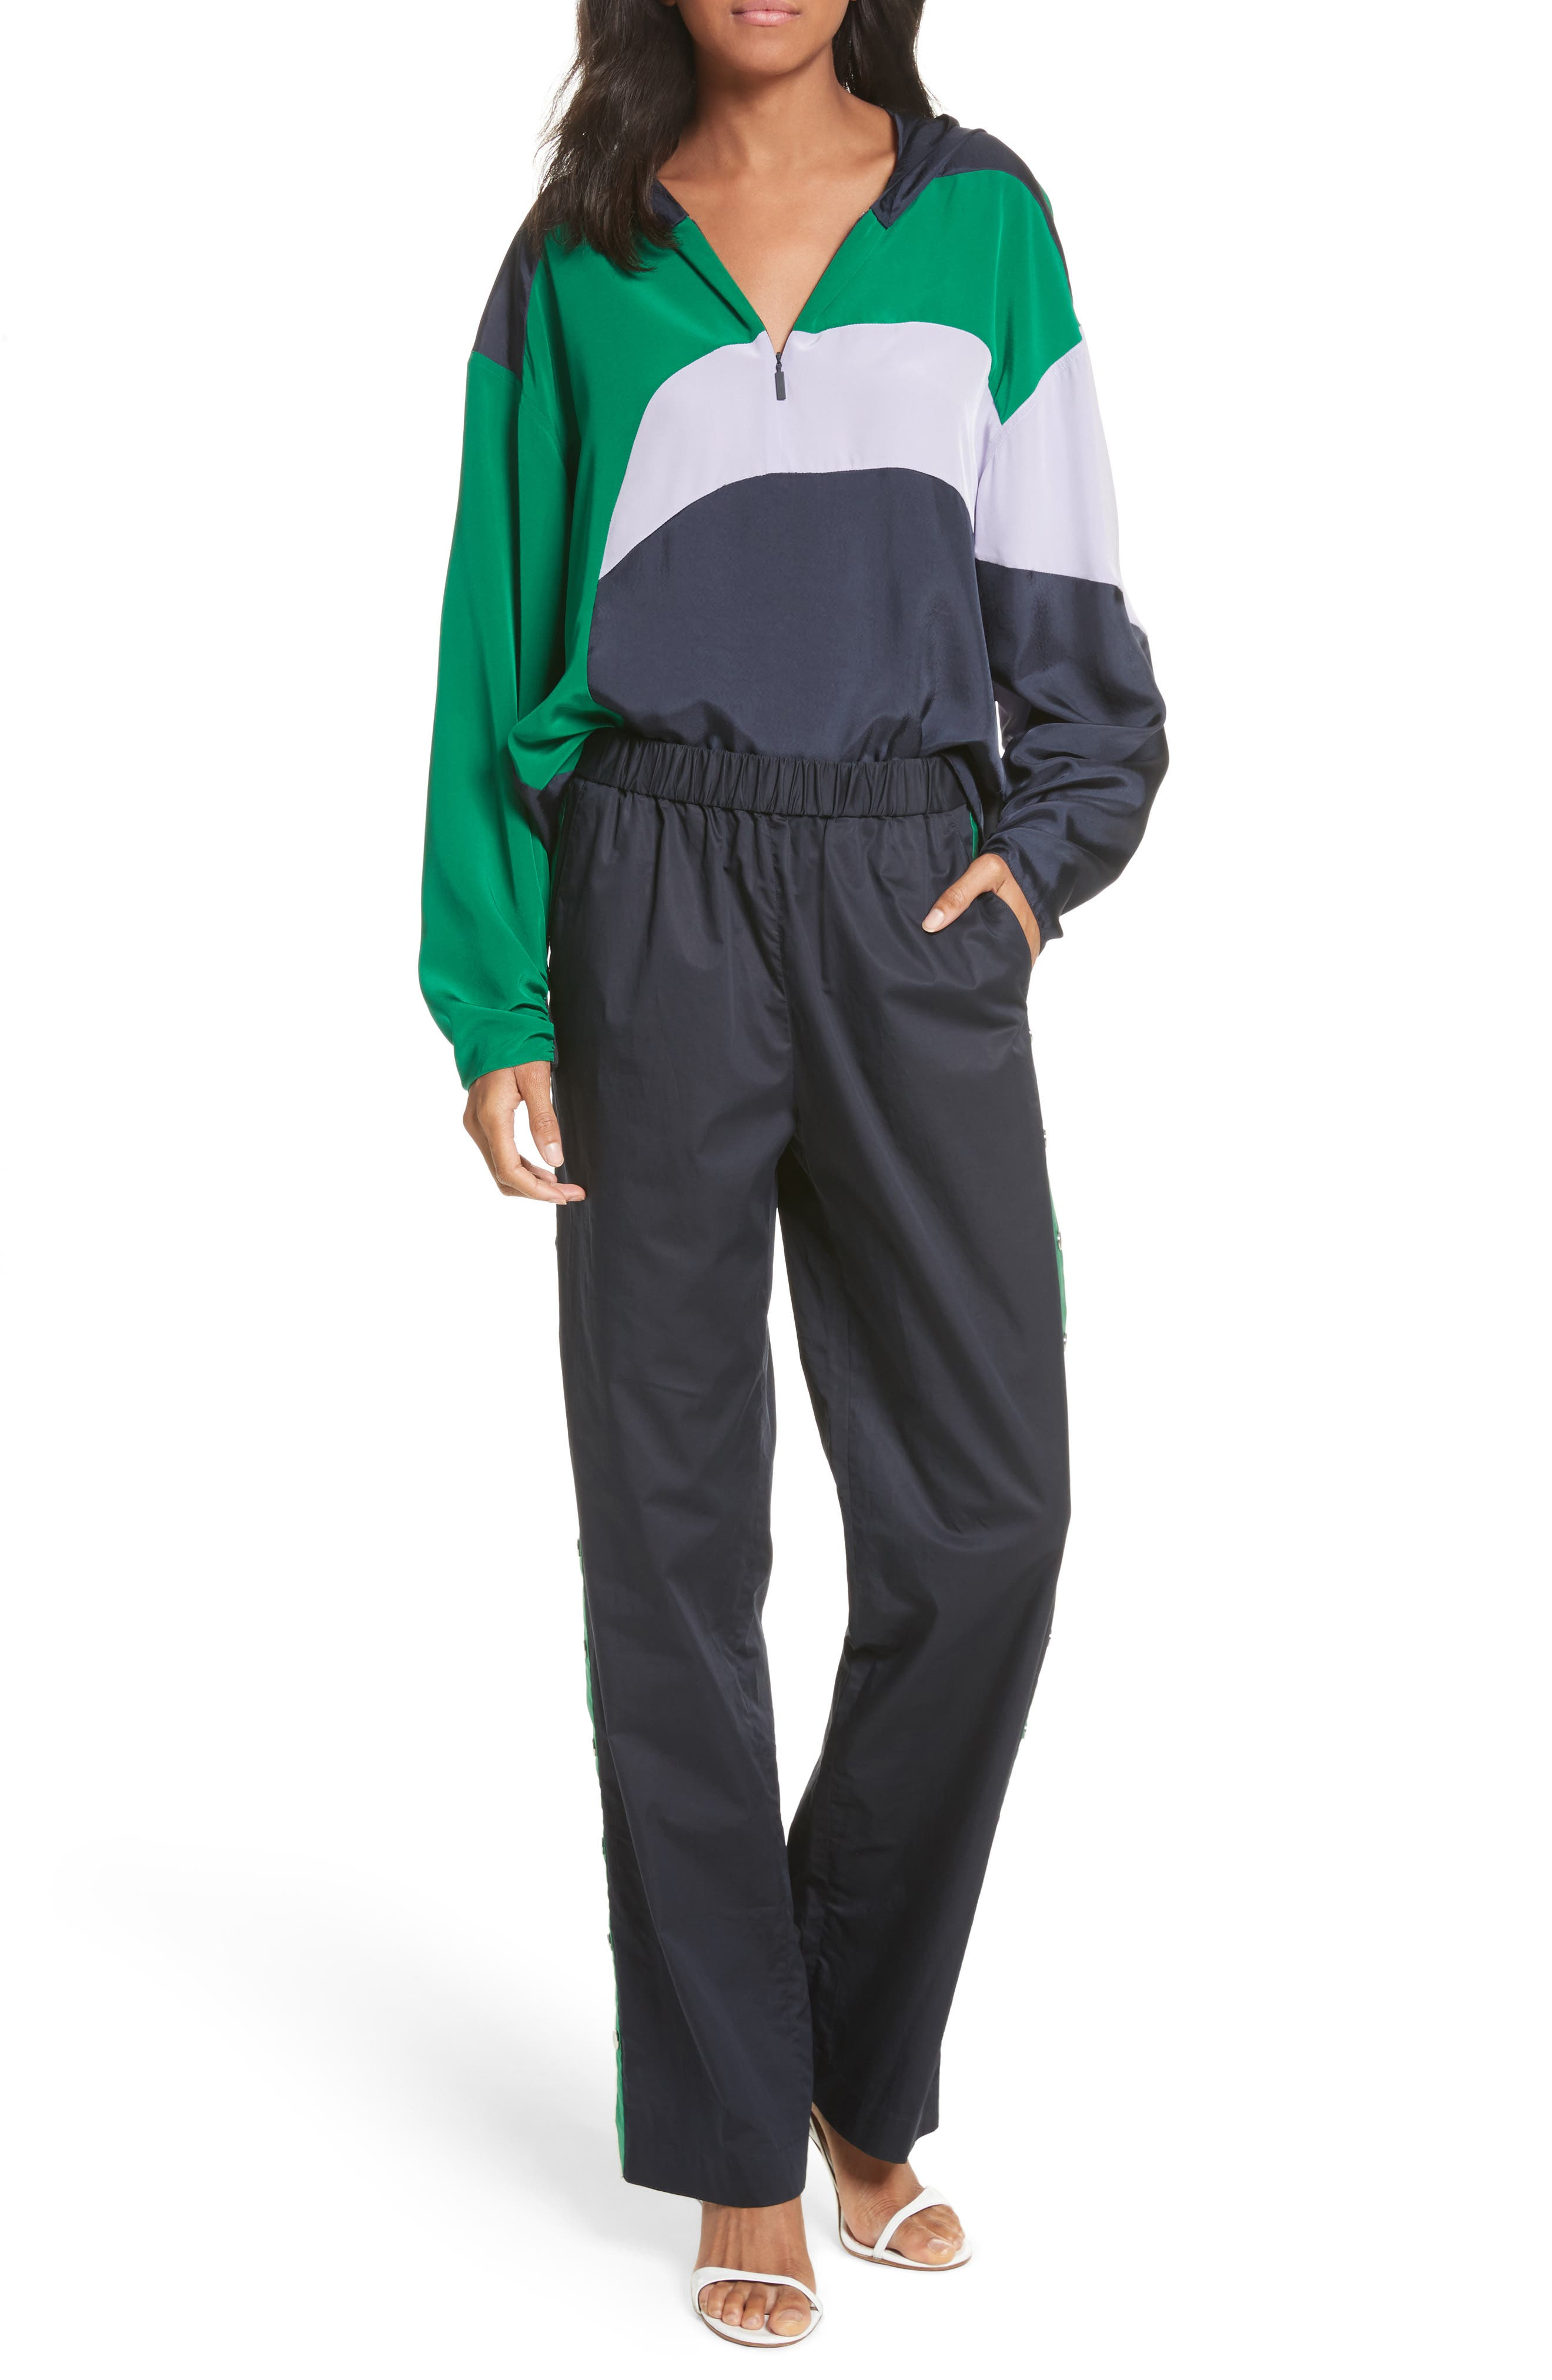 Snap Side Track Pants,                             Alternate thumbnail 6, color,                             Navy/ Green Multi